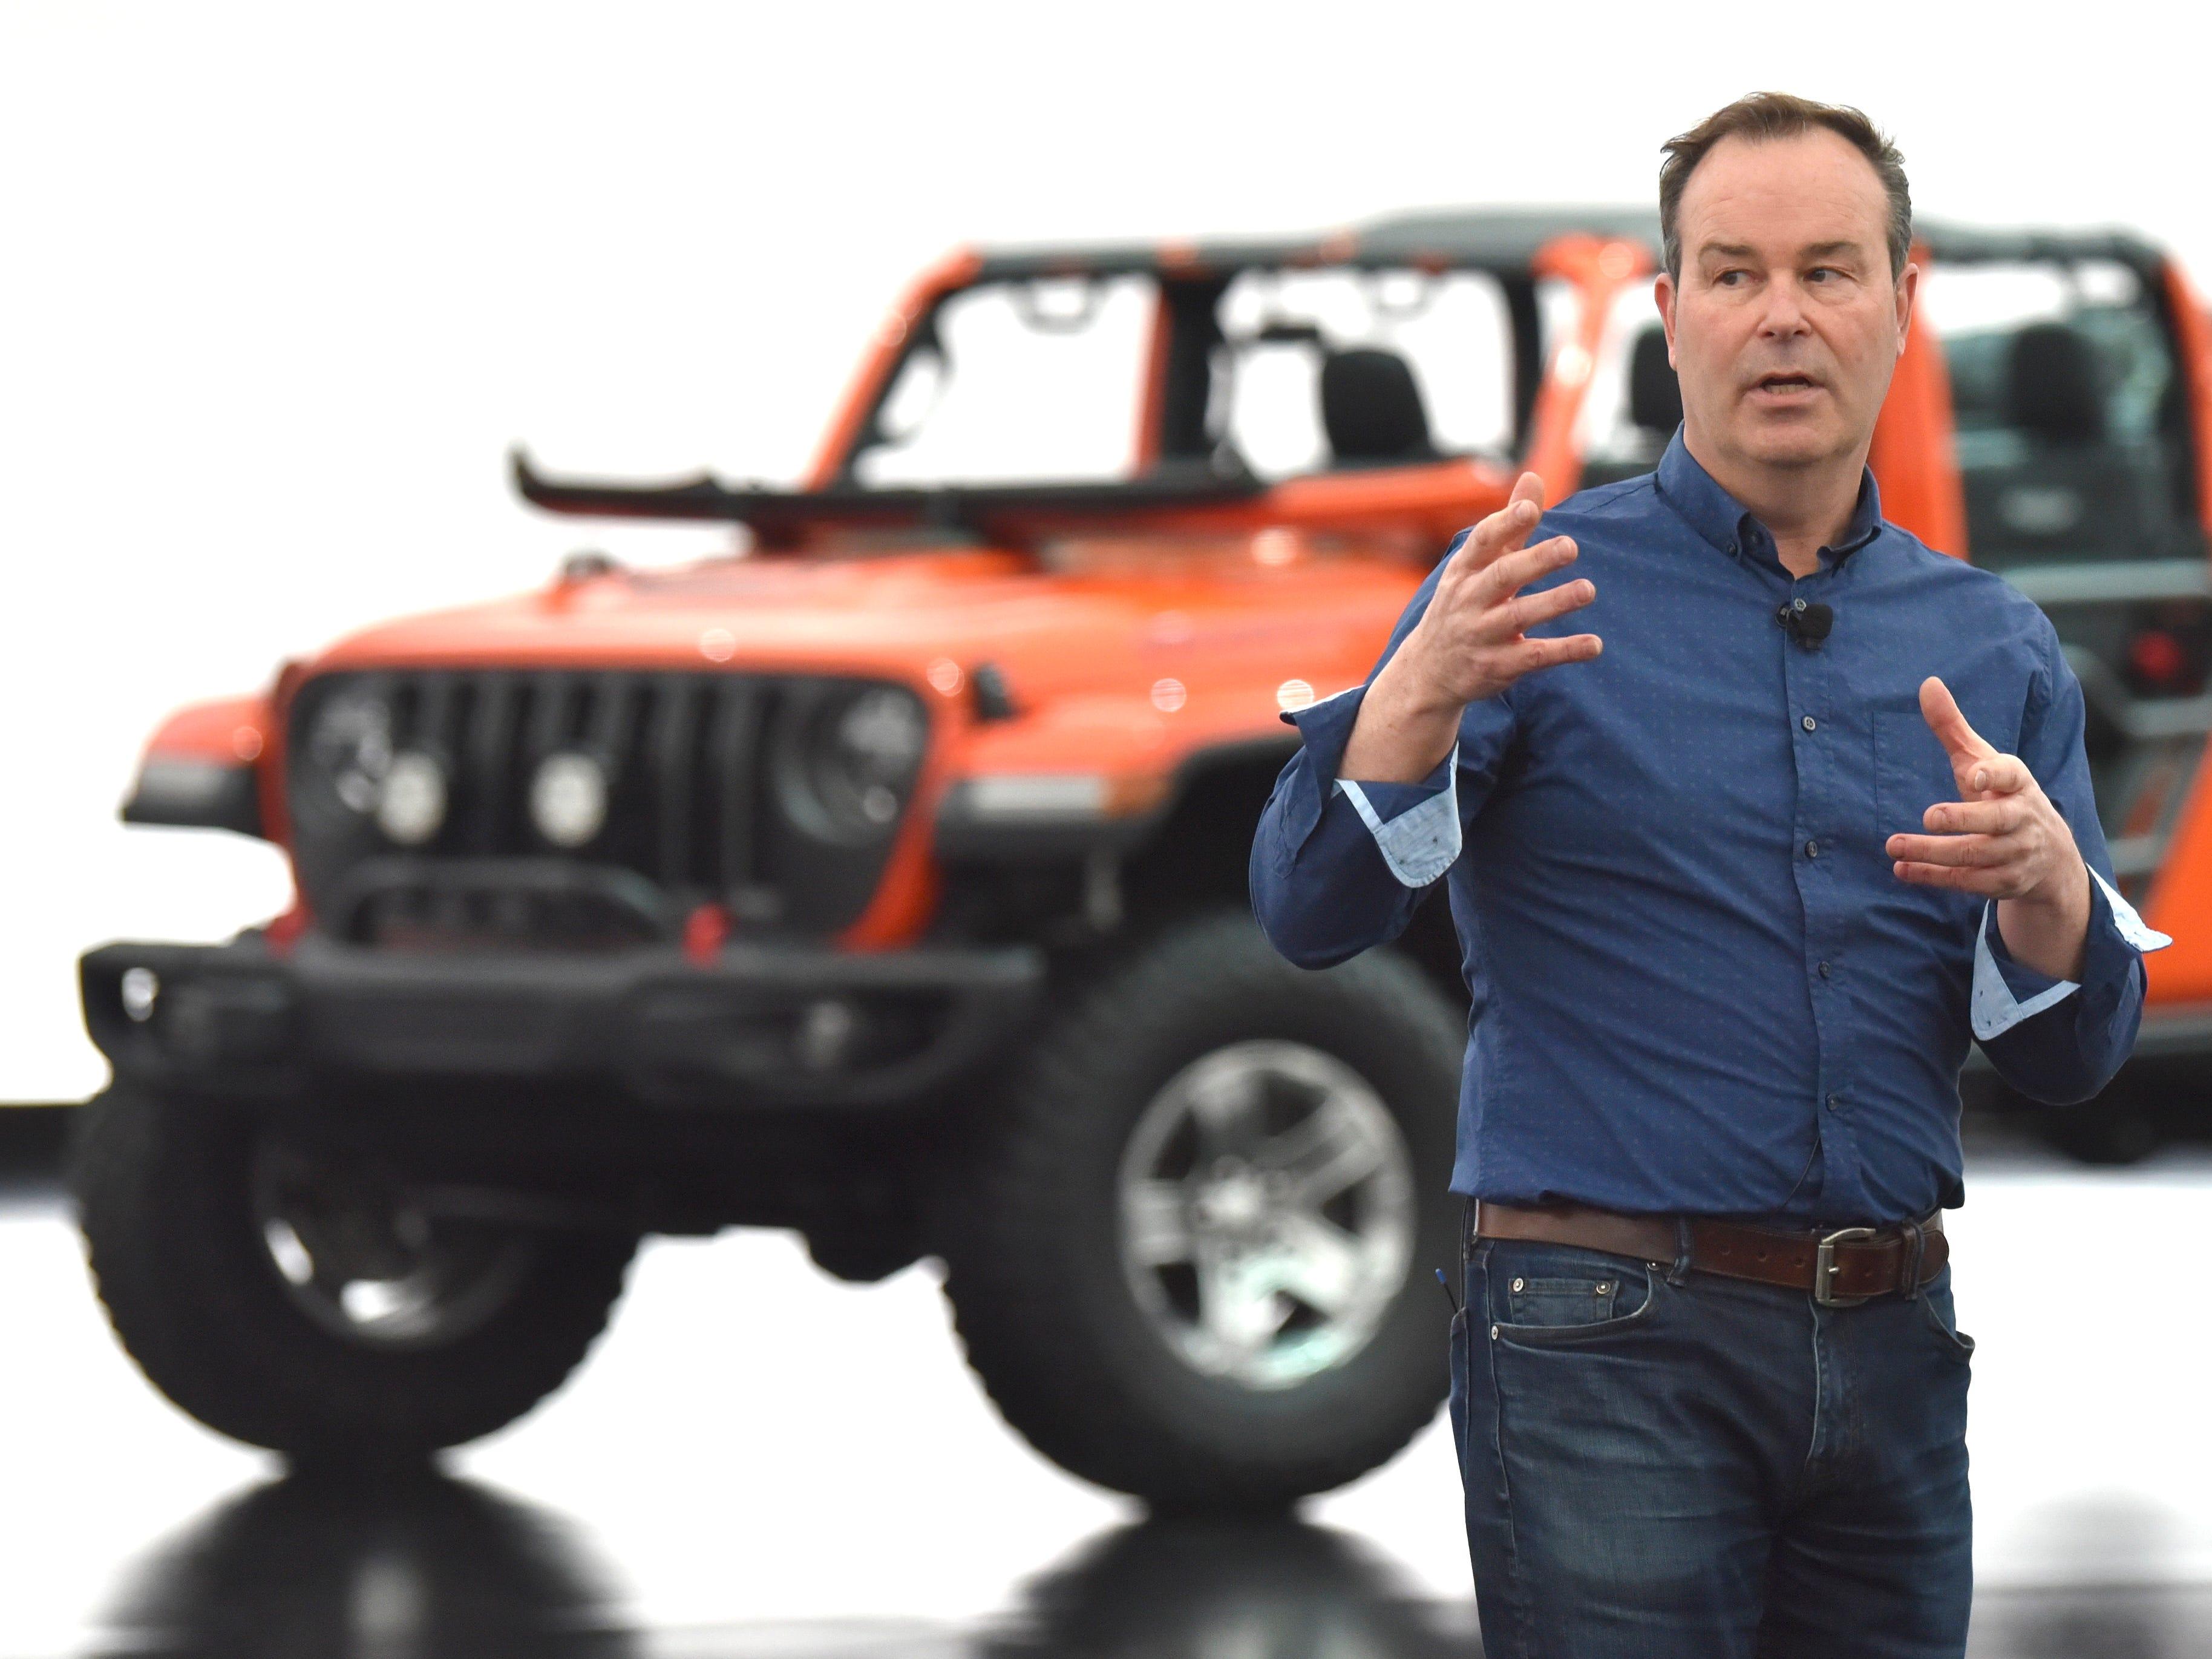 Mark Allen, head of Jeep design, talks in front of Jeep Gladiator Gravity.